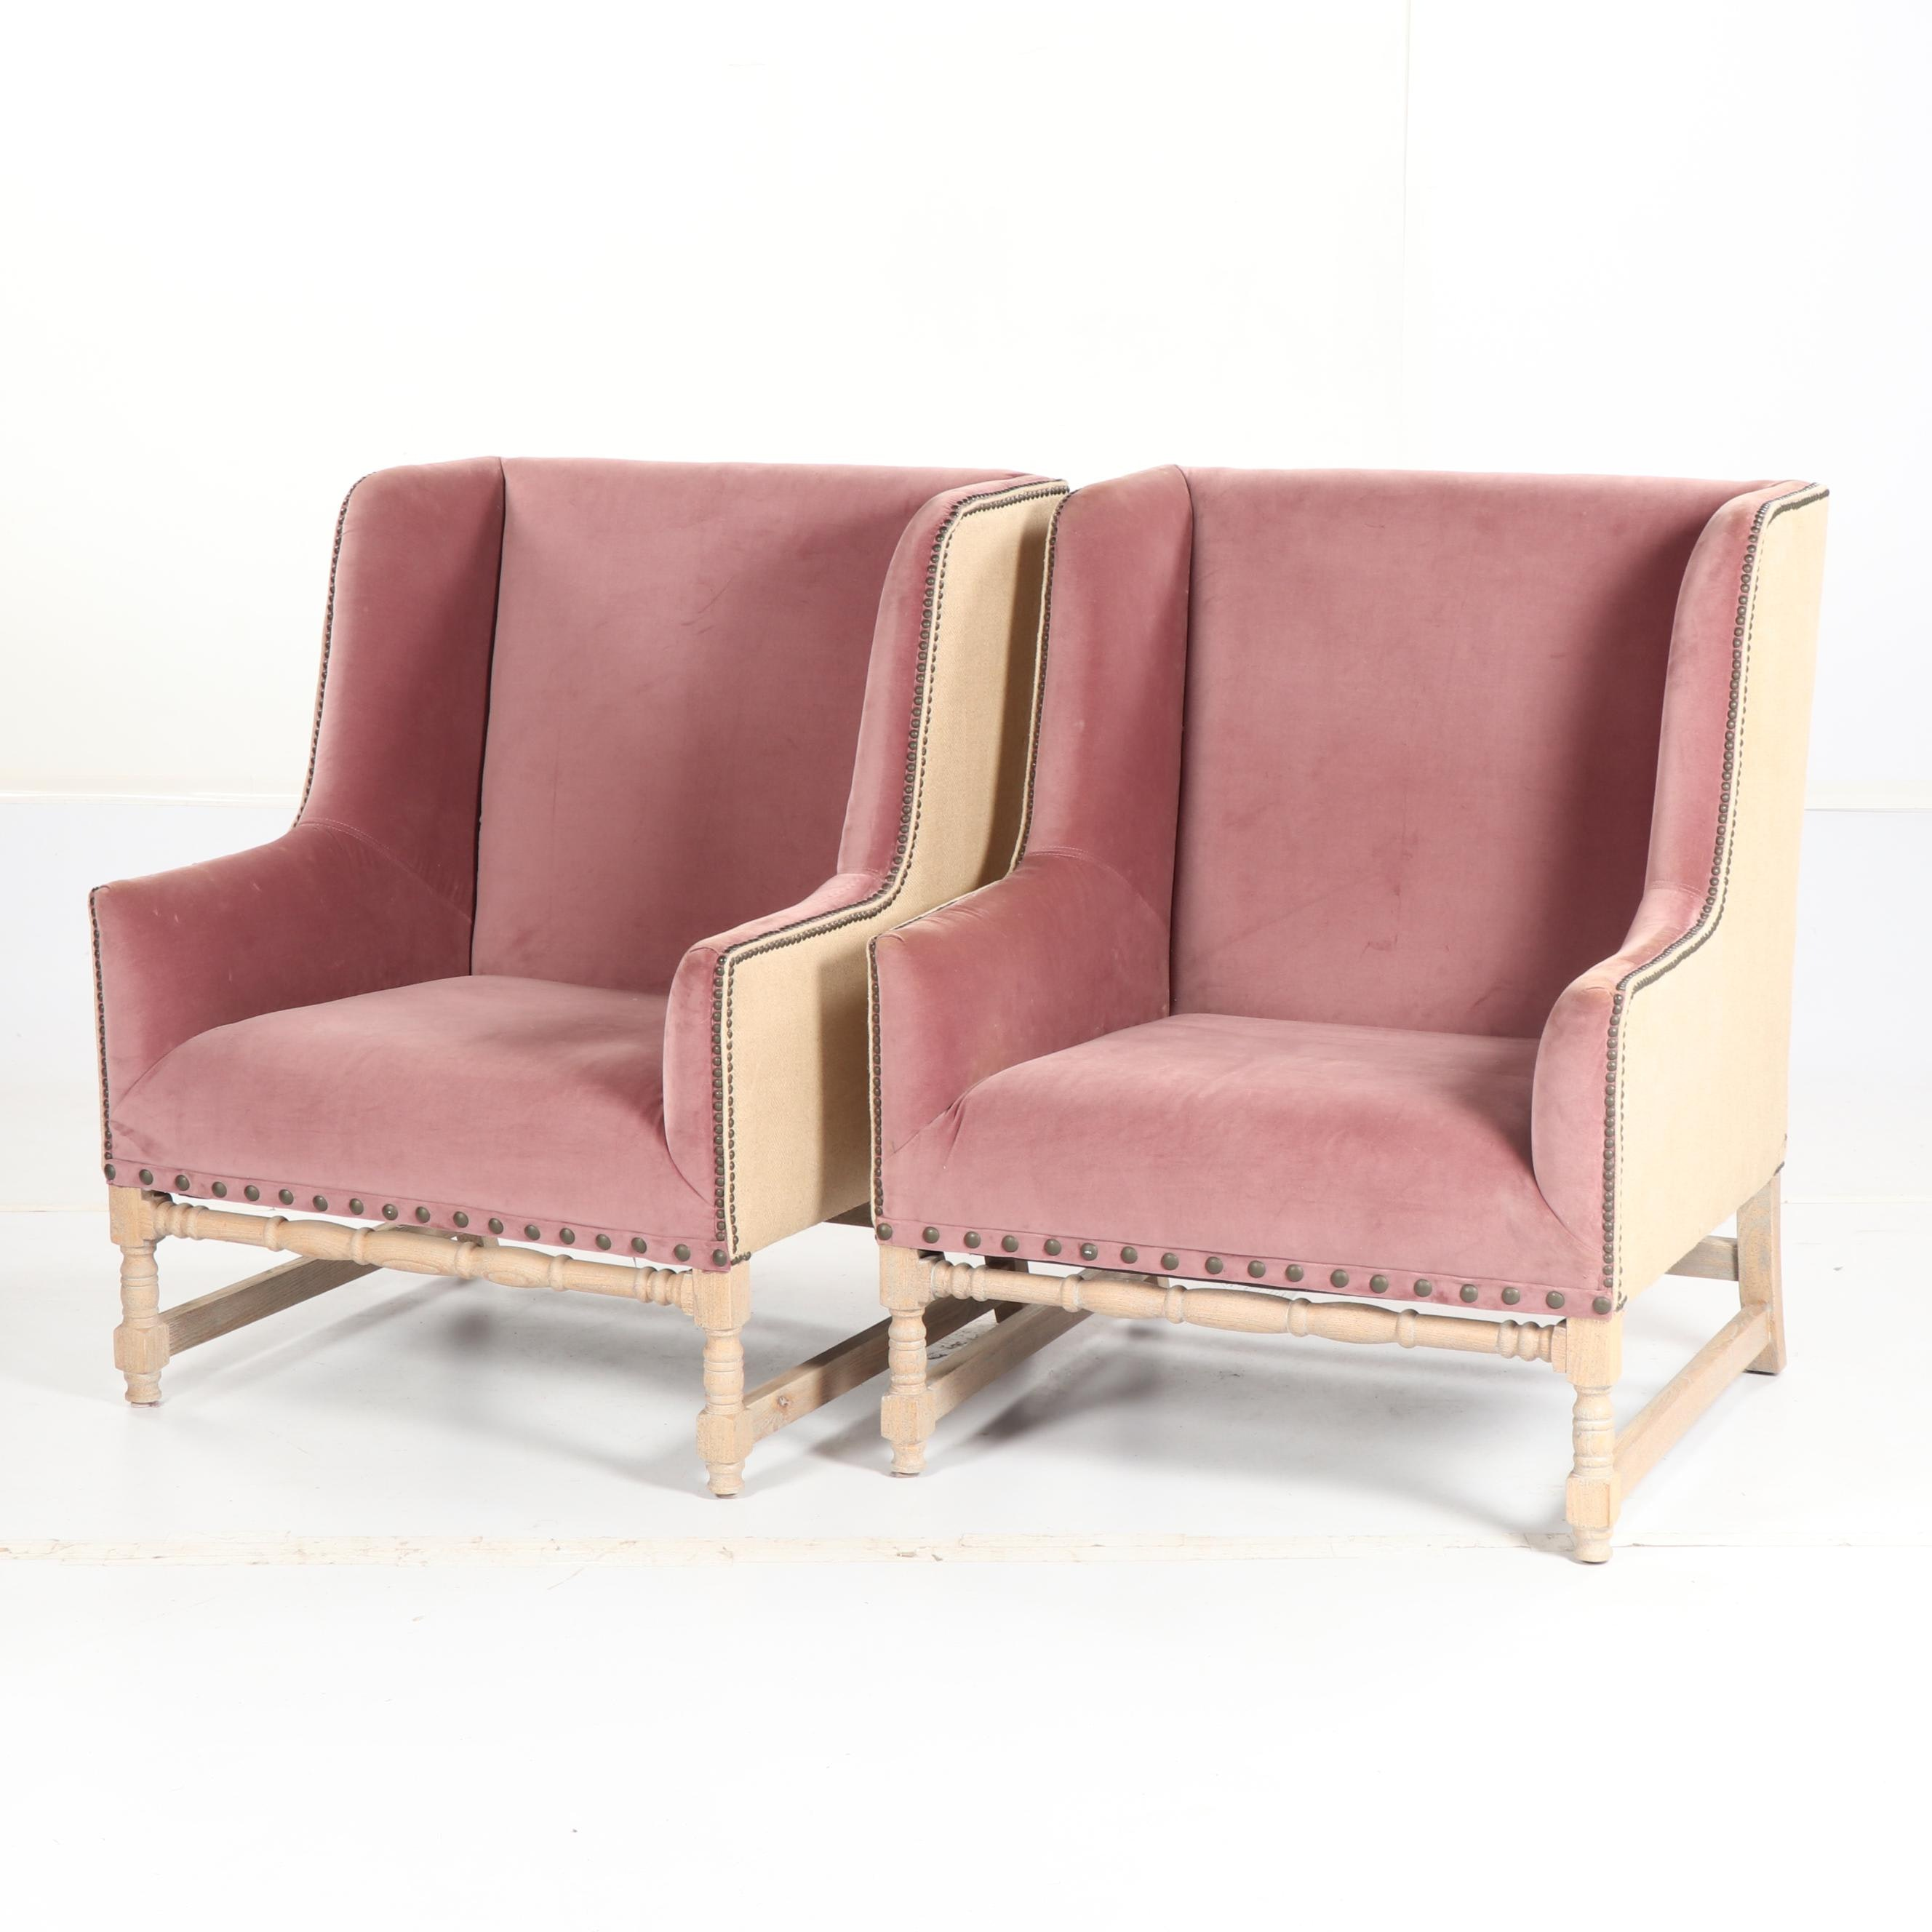 Velvet Upholstered Wingback Armchairs by Walter E. Smithe, 21st Century